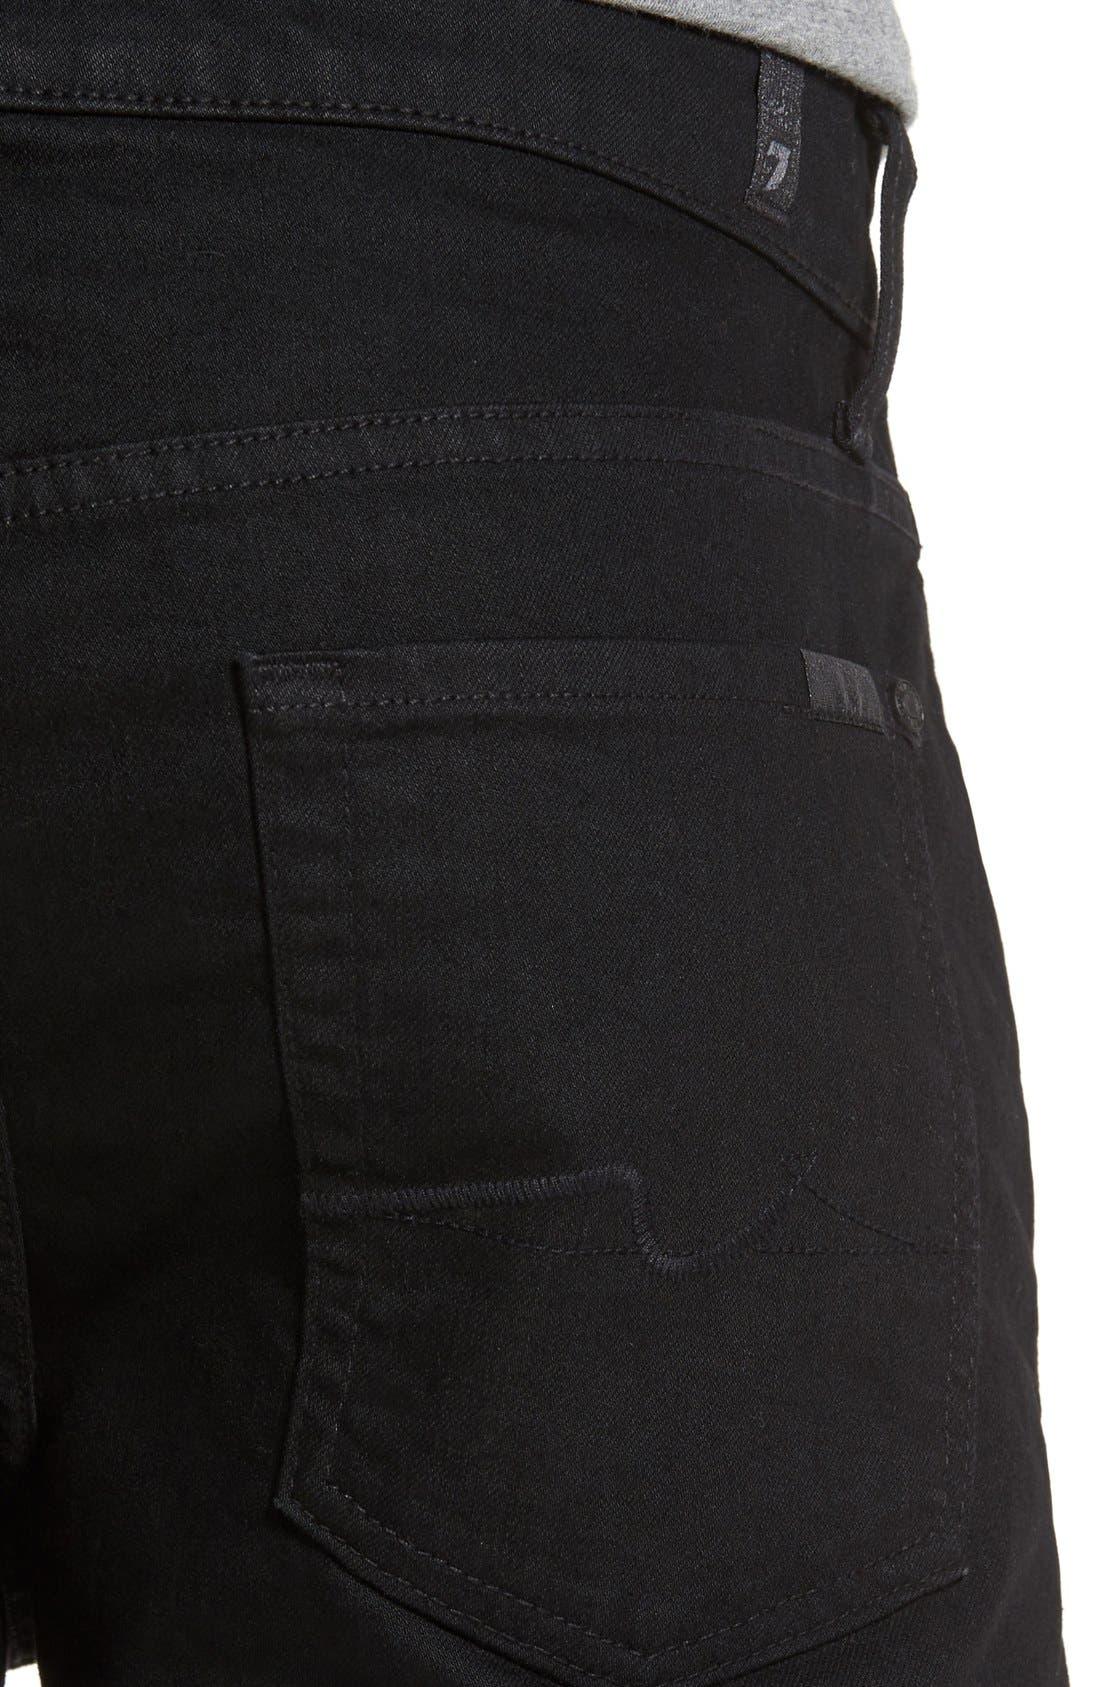 Slimmy Slim Fit Jeans,                             Alternate thumbnail 4, color,                             Towne Black